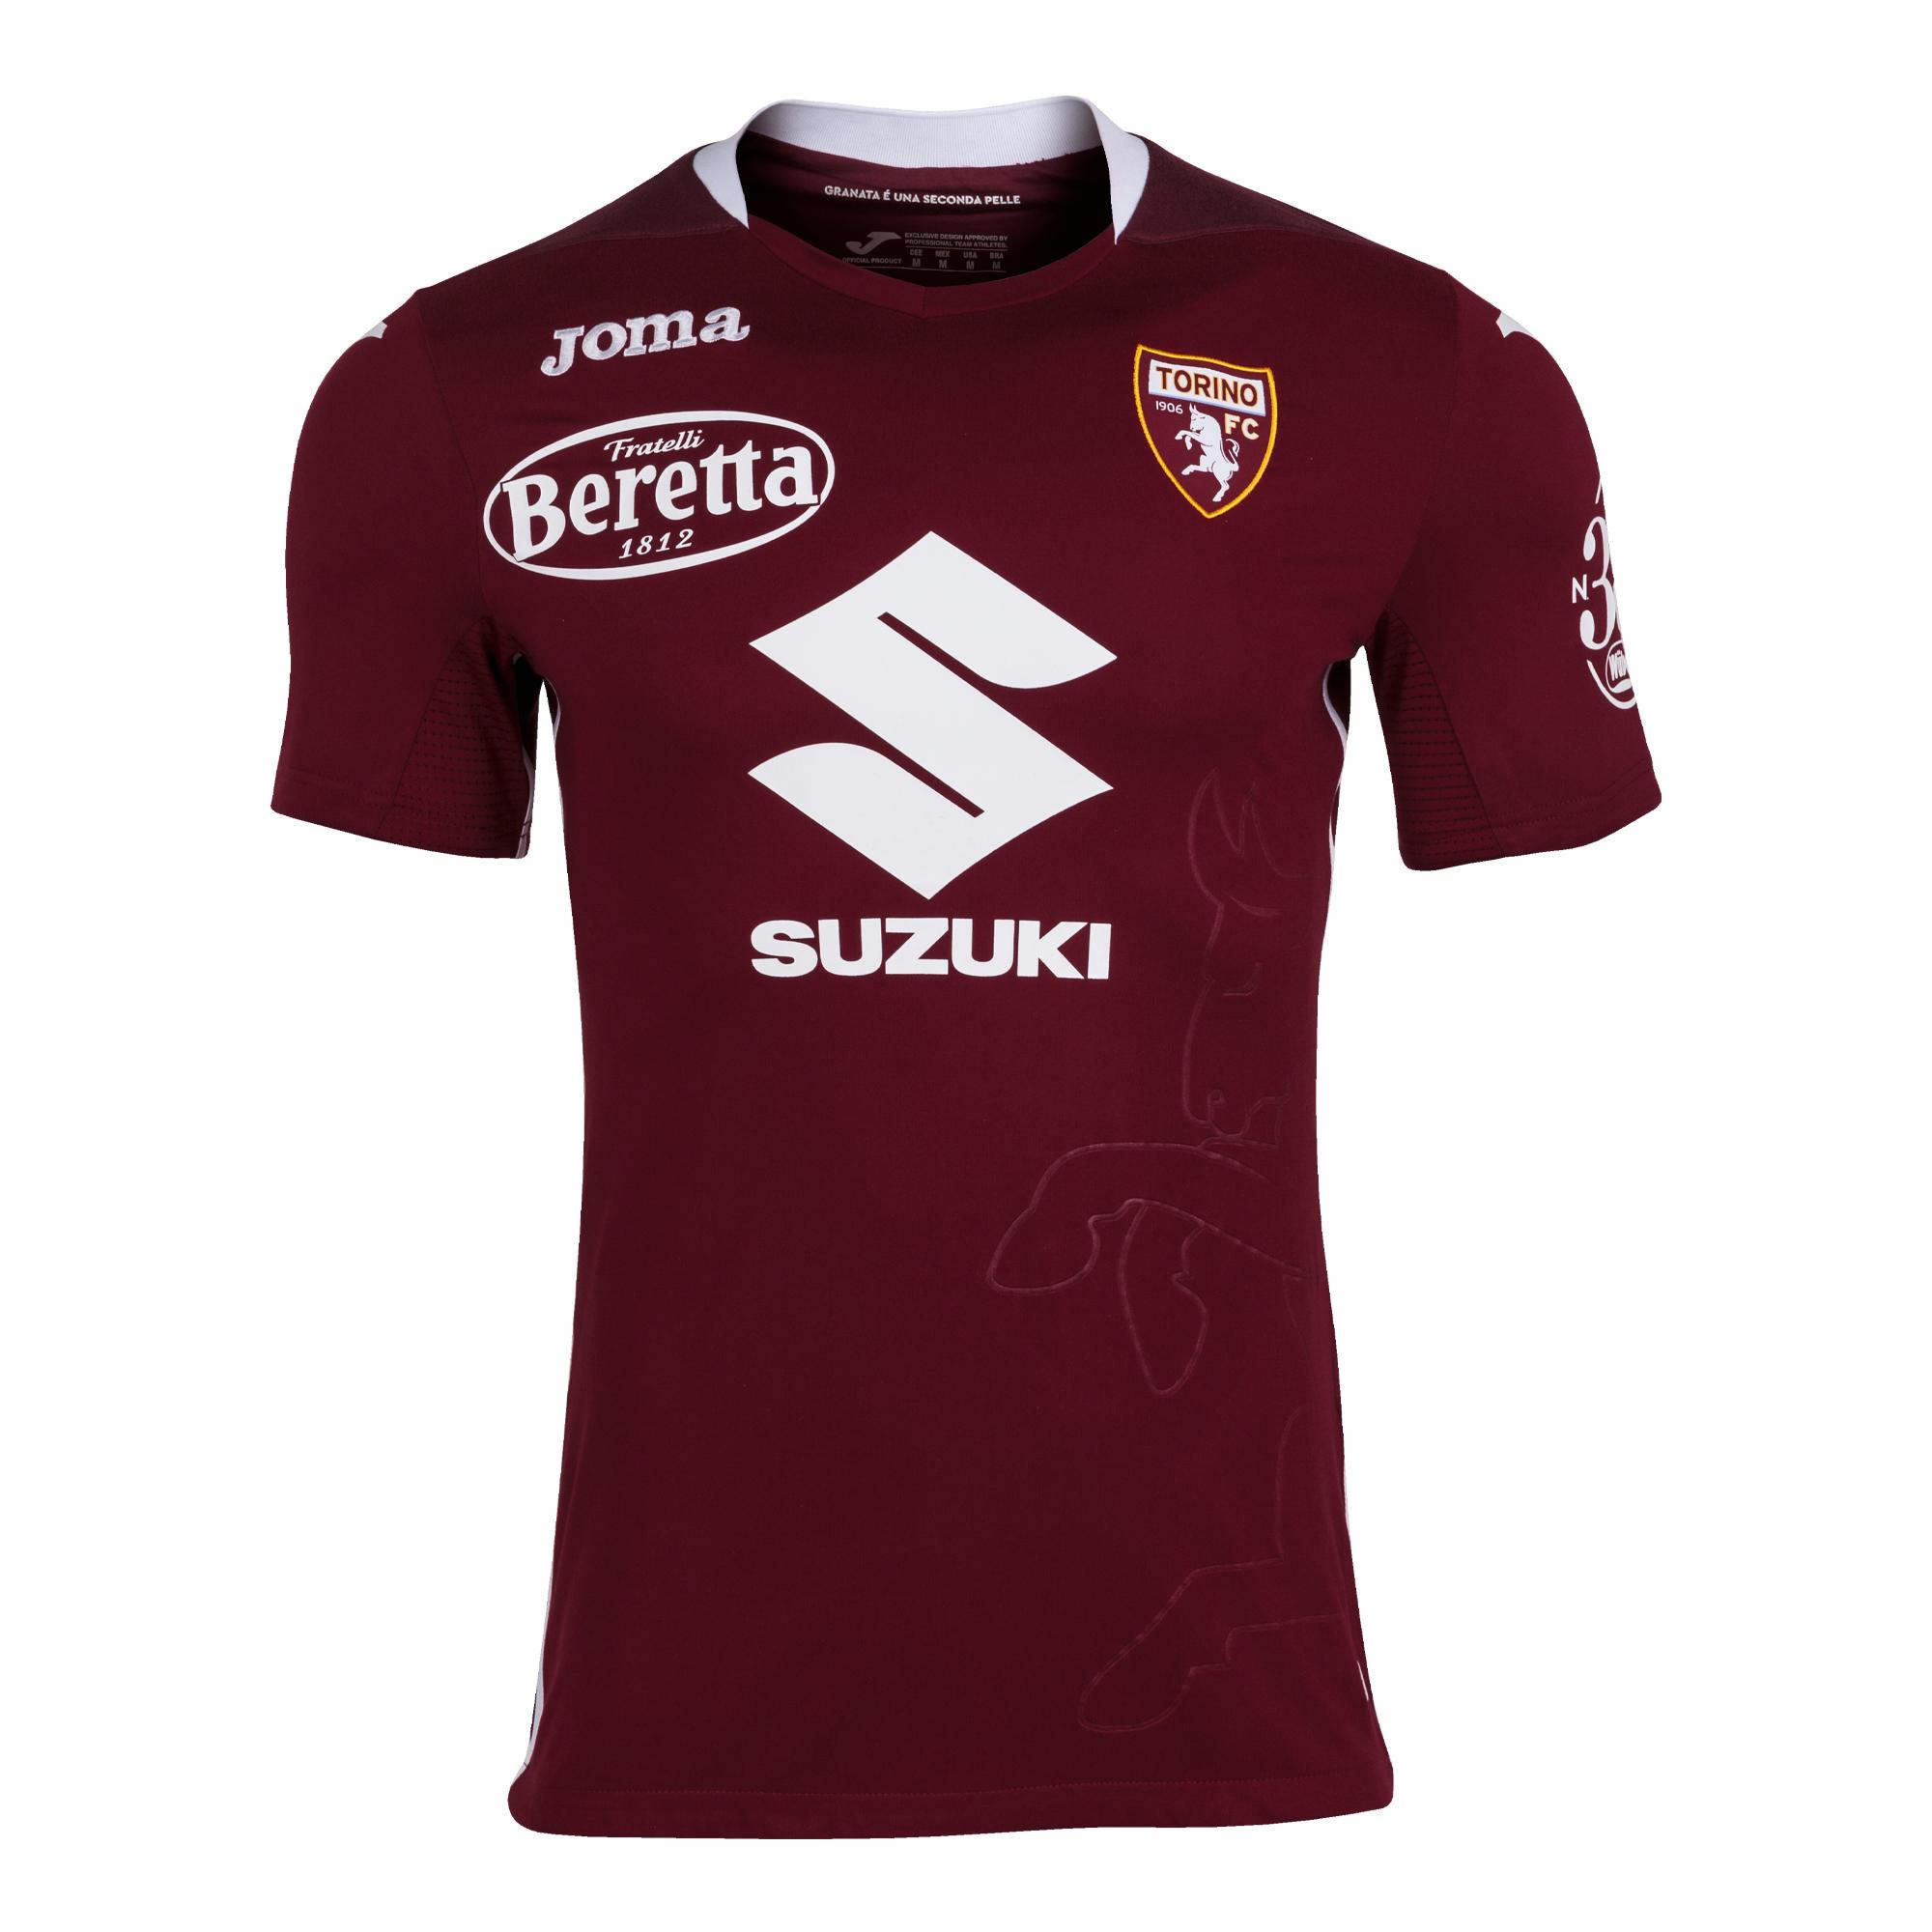 Torino 2020-21 Joma Home & Away Kits | 20/21 Kits | Football shirt ...